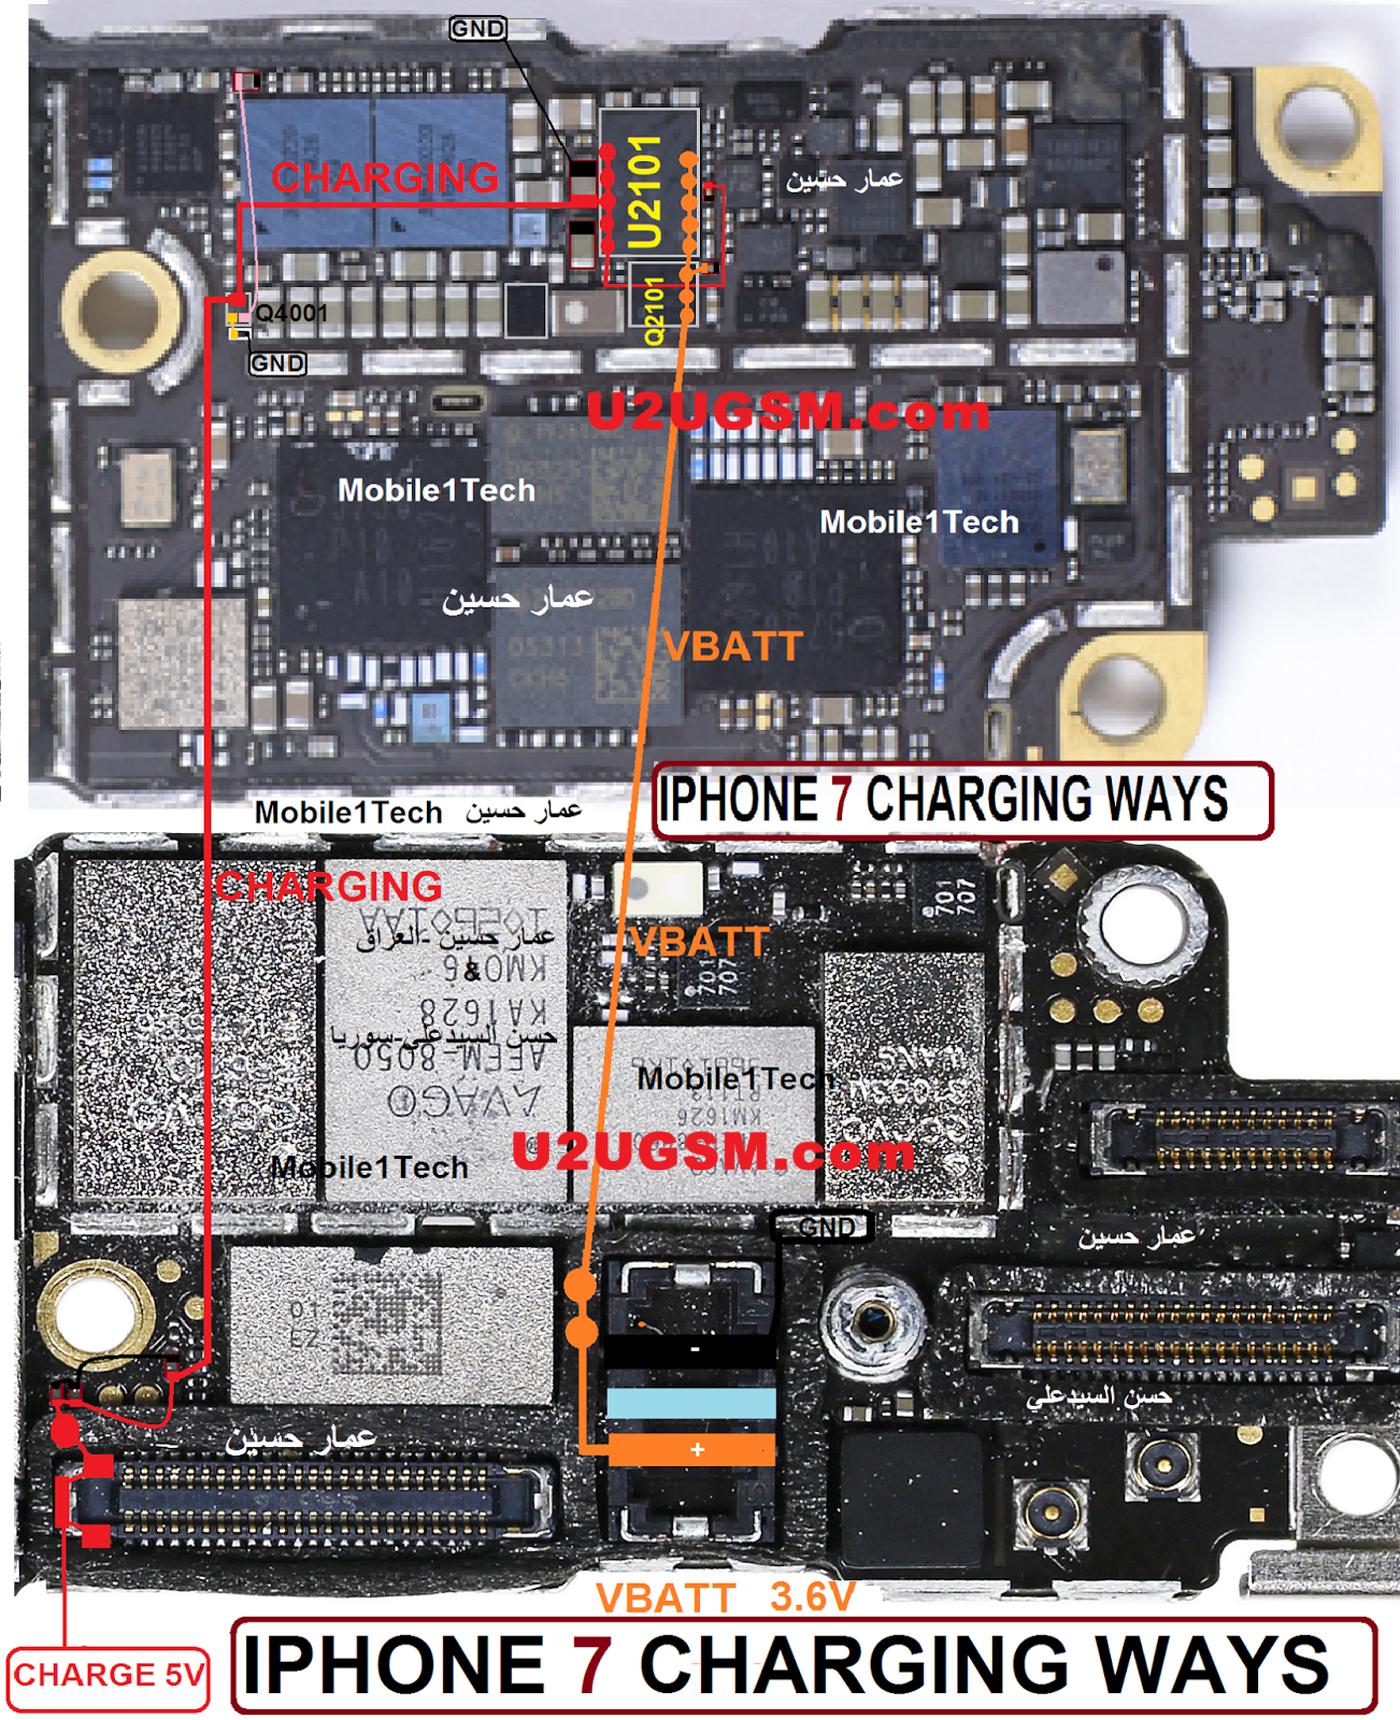 medium resolution of iphone 7 usb charging problem solution jumper ways download freeiphone 7 usb charging problem solution jumper